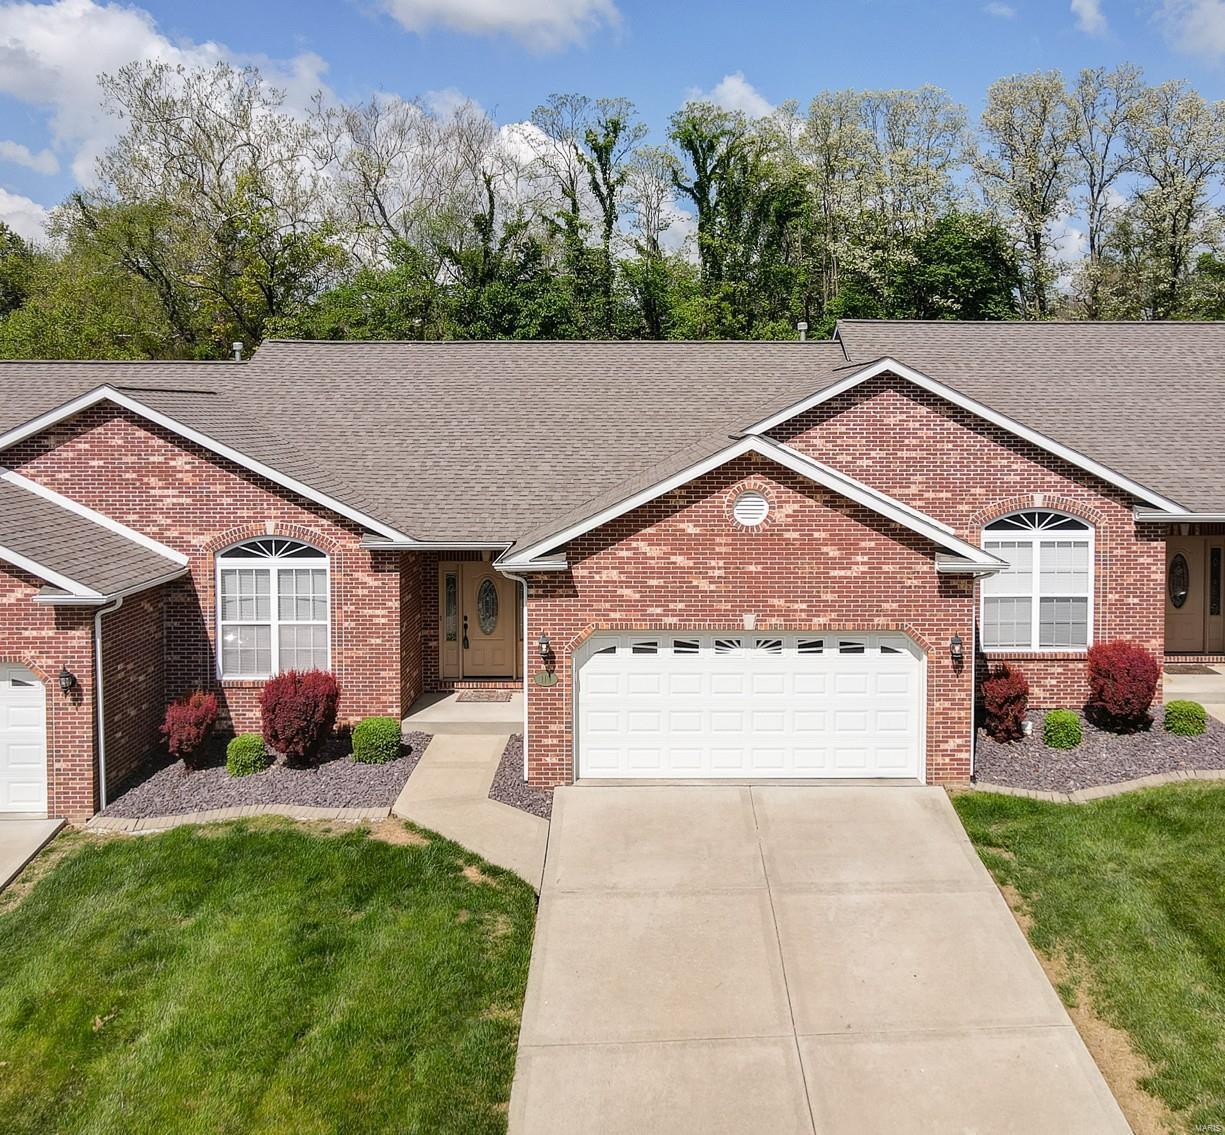 119 Briar Ridge Property Photo - Maryville, IL real estate listing